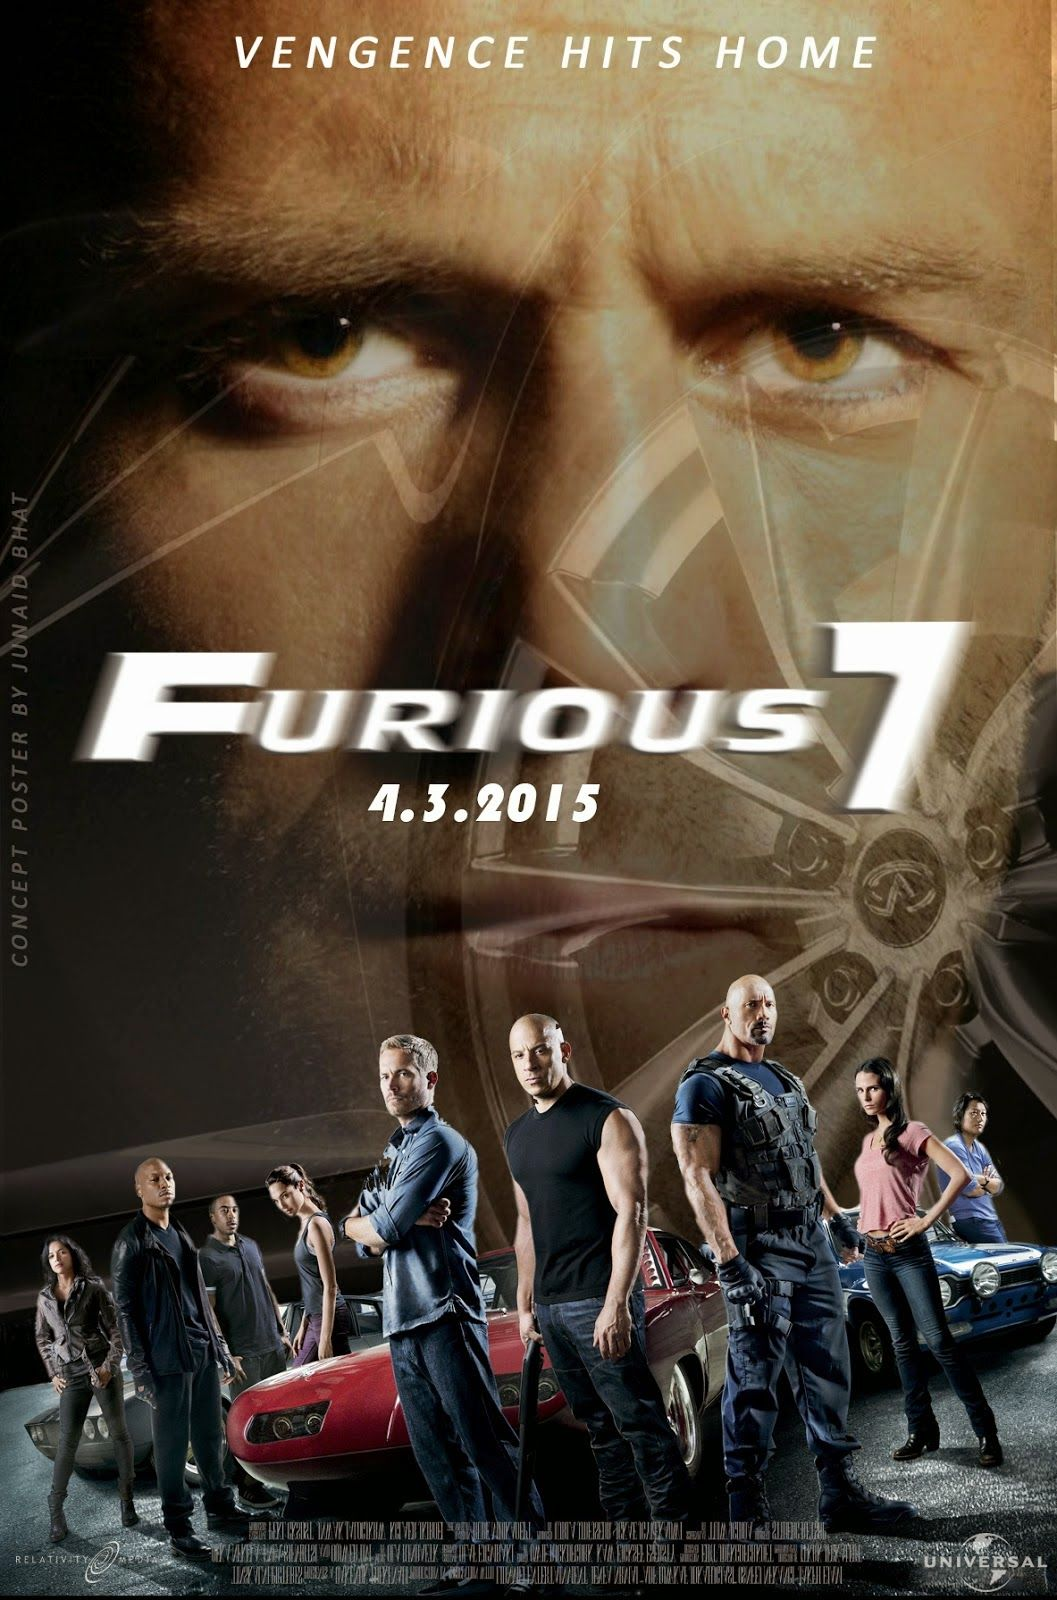 Fast And Furious 7 Sub Indo : furious, مجموعة, صور, Nonton, Furious, Movie, Subtitle, Indonesia